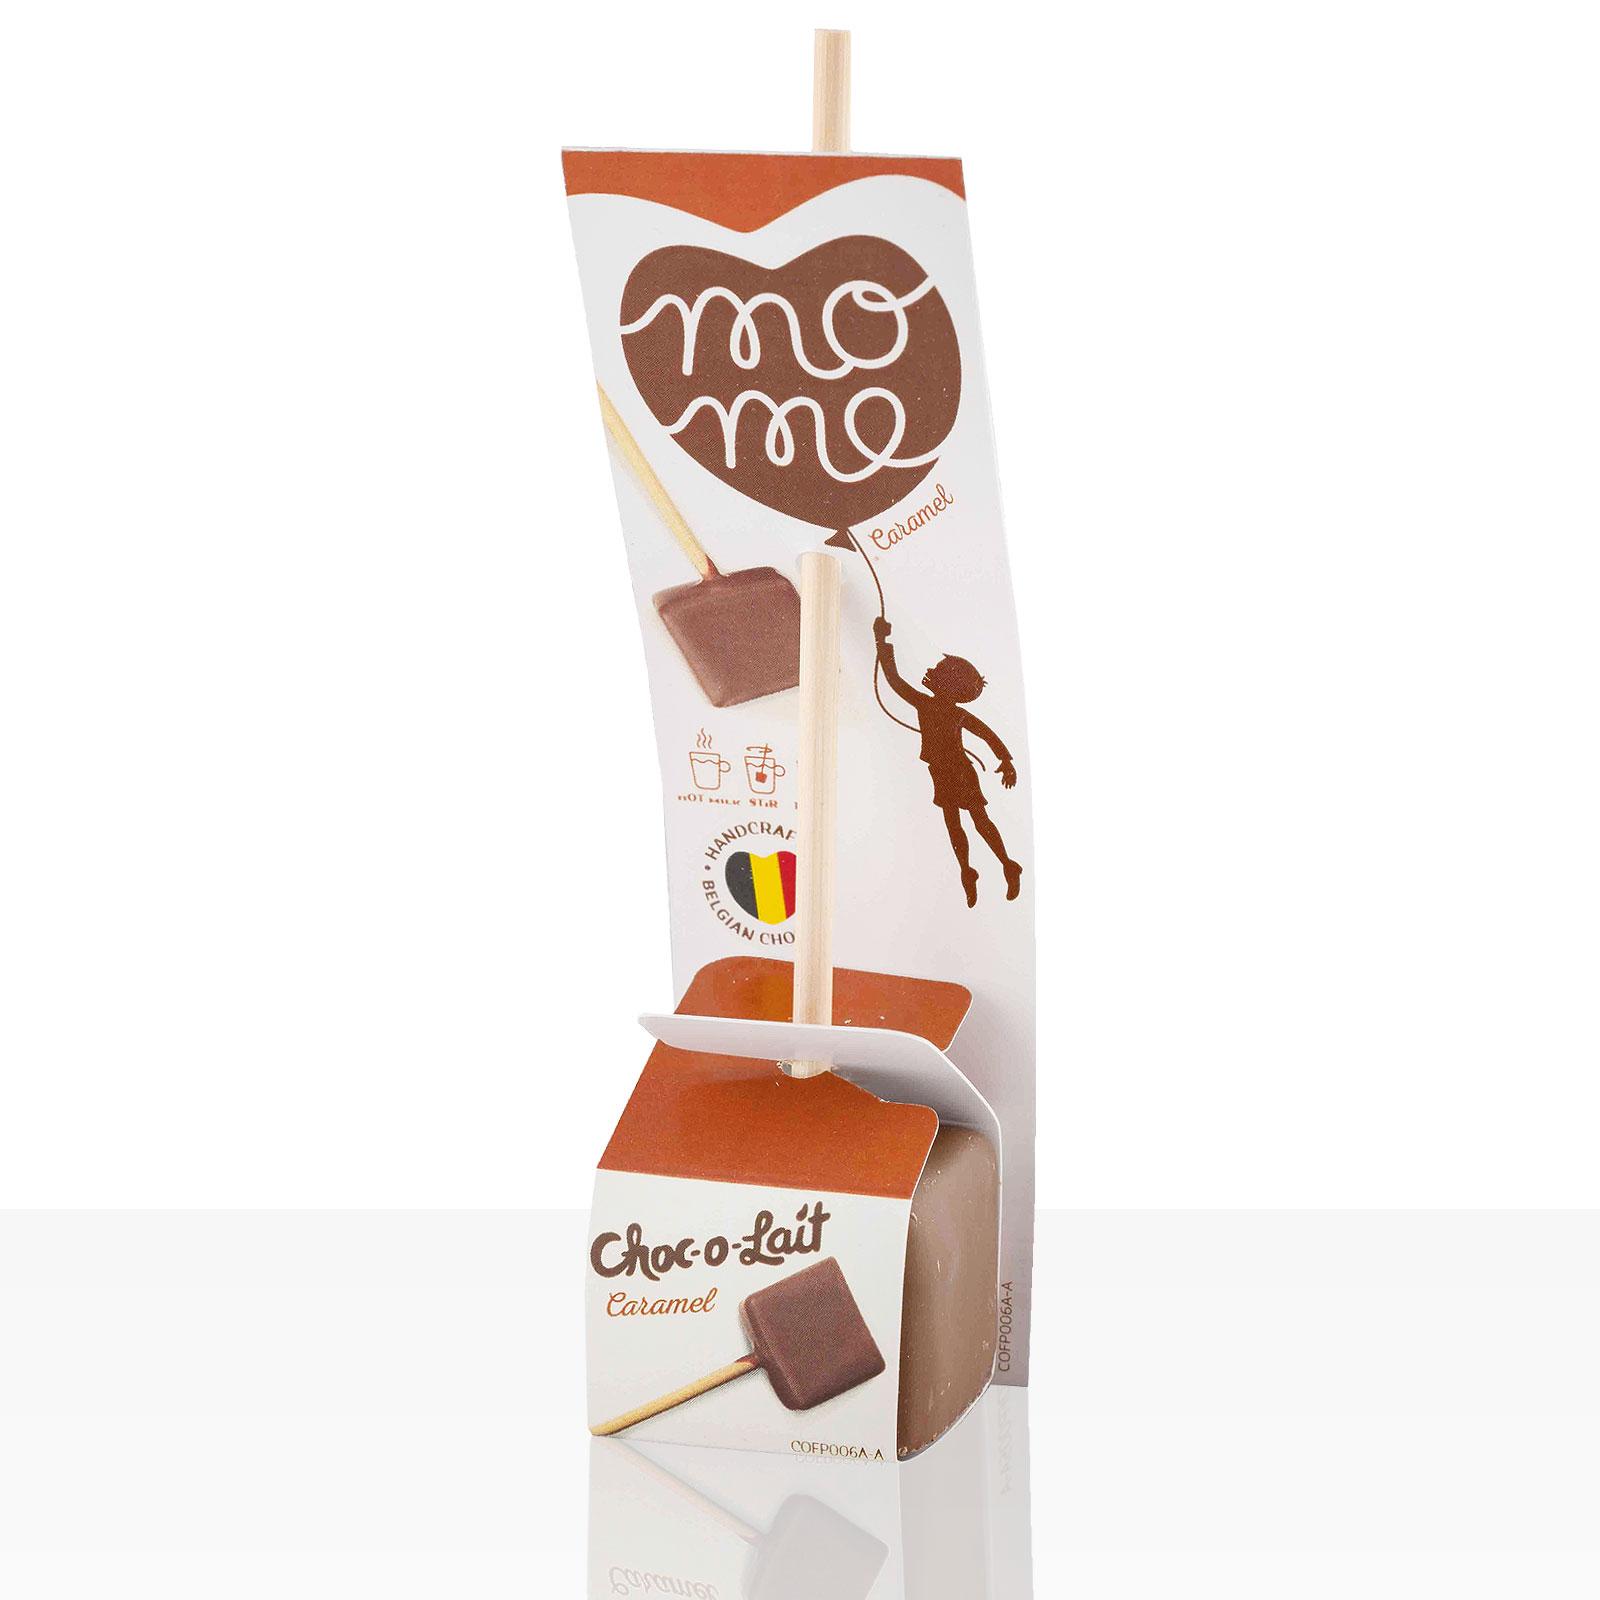 Choc-o-lait Trinkschokolade am Stiel Caramel im Displaykarton 24Stk